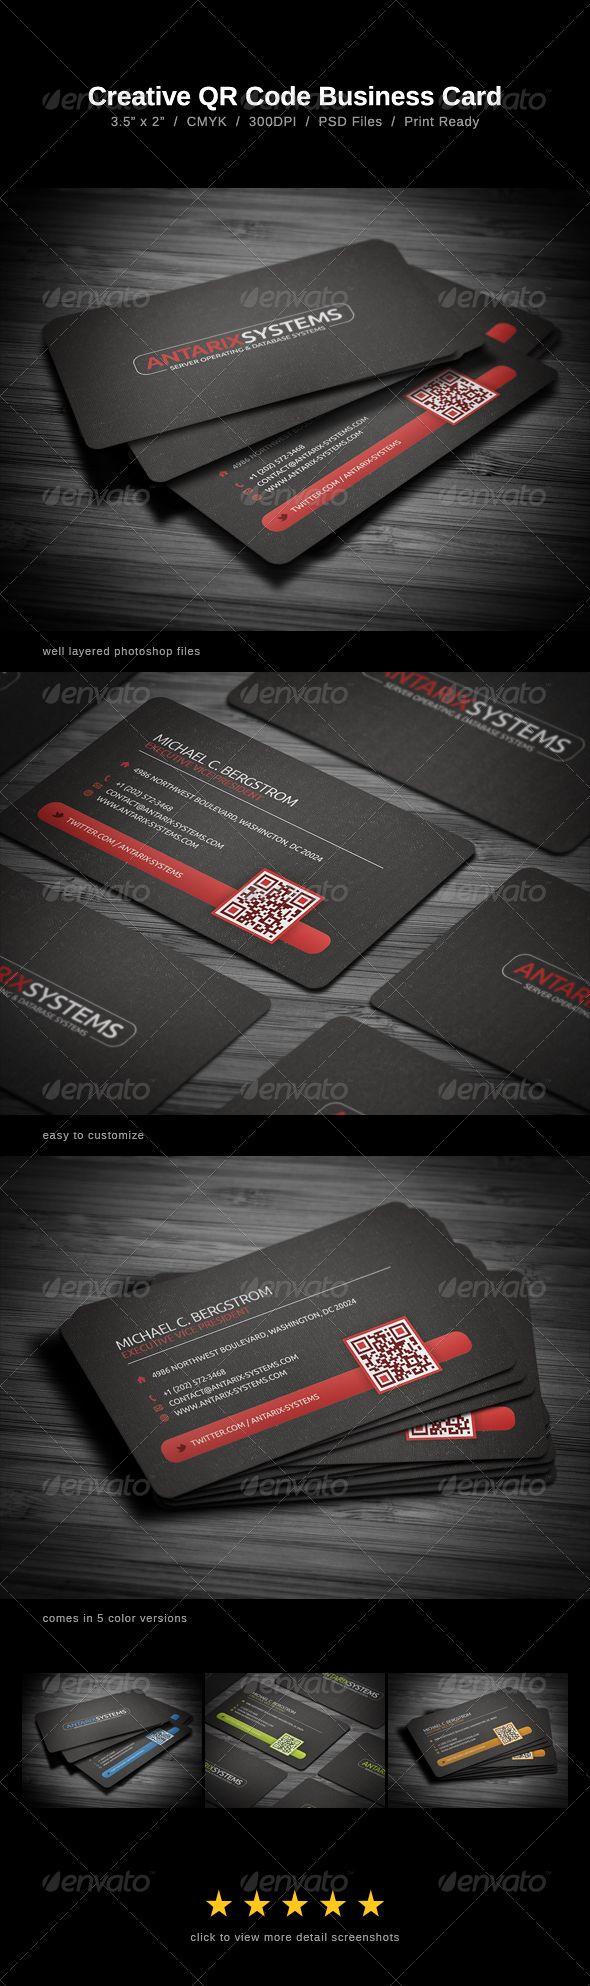 Best 25 qr code business card ideas on pinterest sample creative qr code business card business card template psd download here http magicingreecefo Images